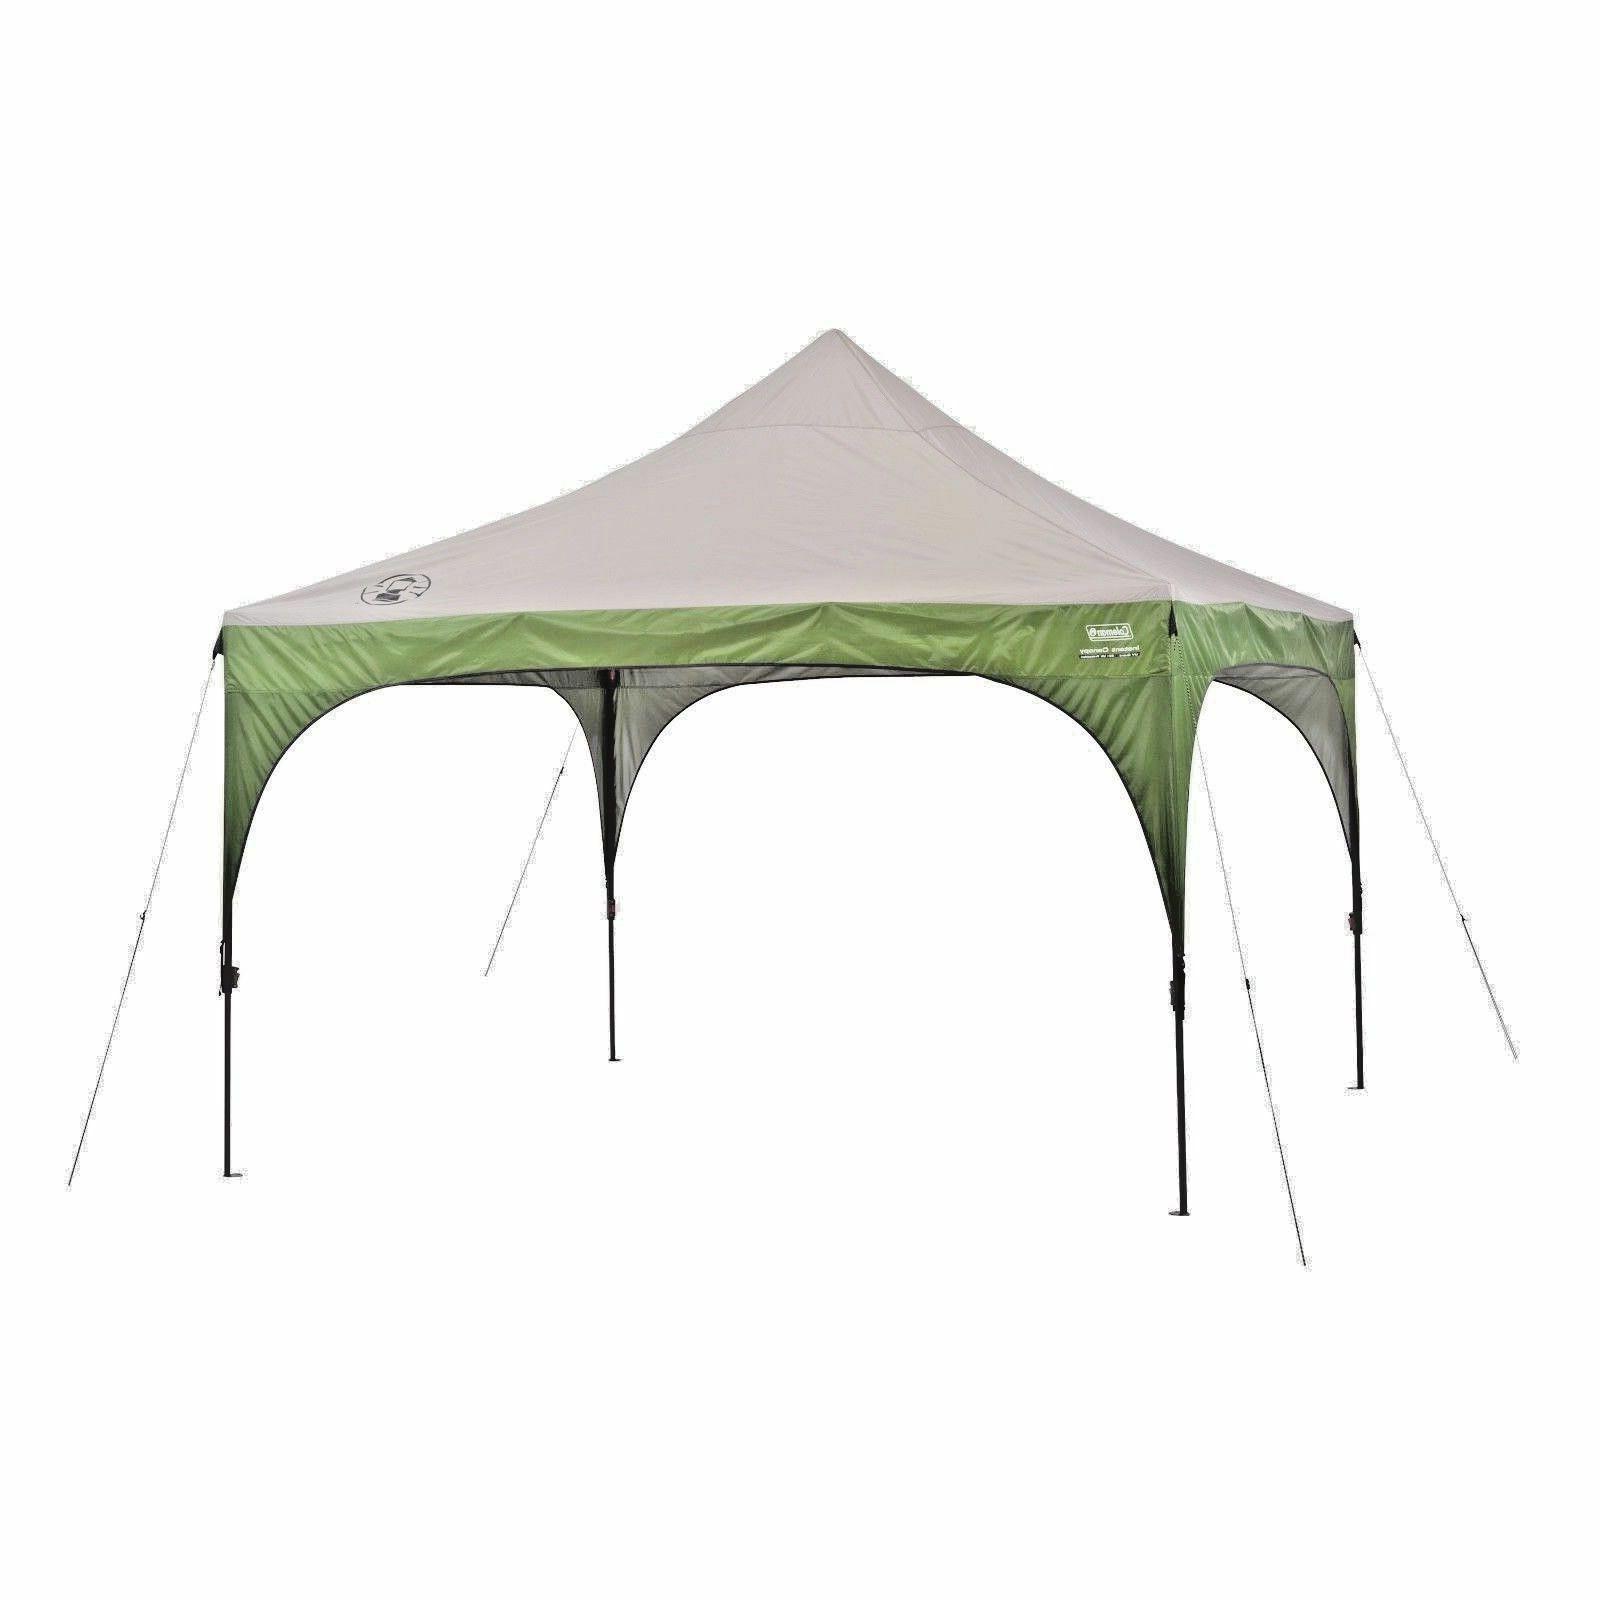 12 x 12 straight leg instant canopy